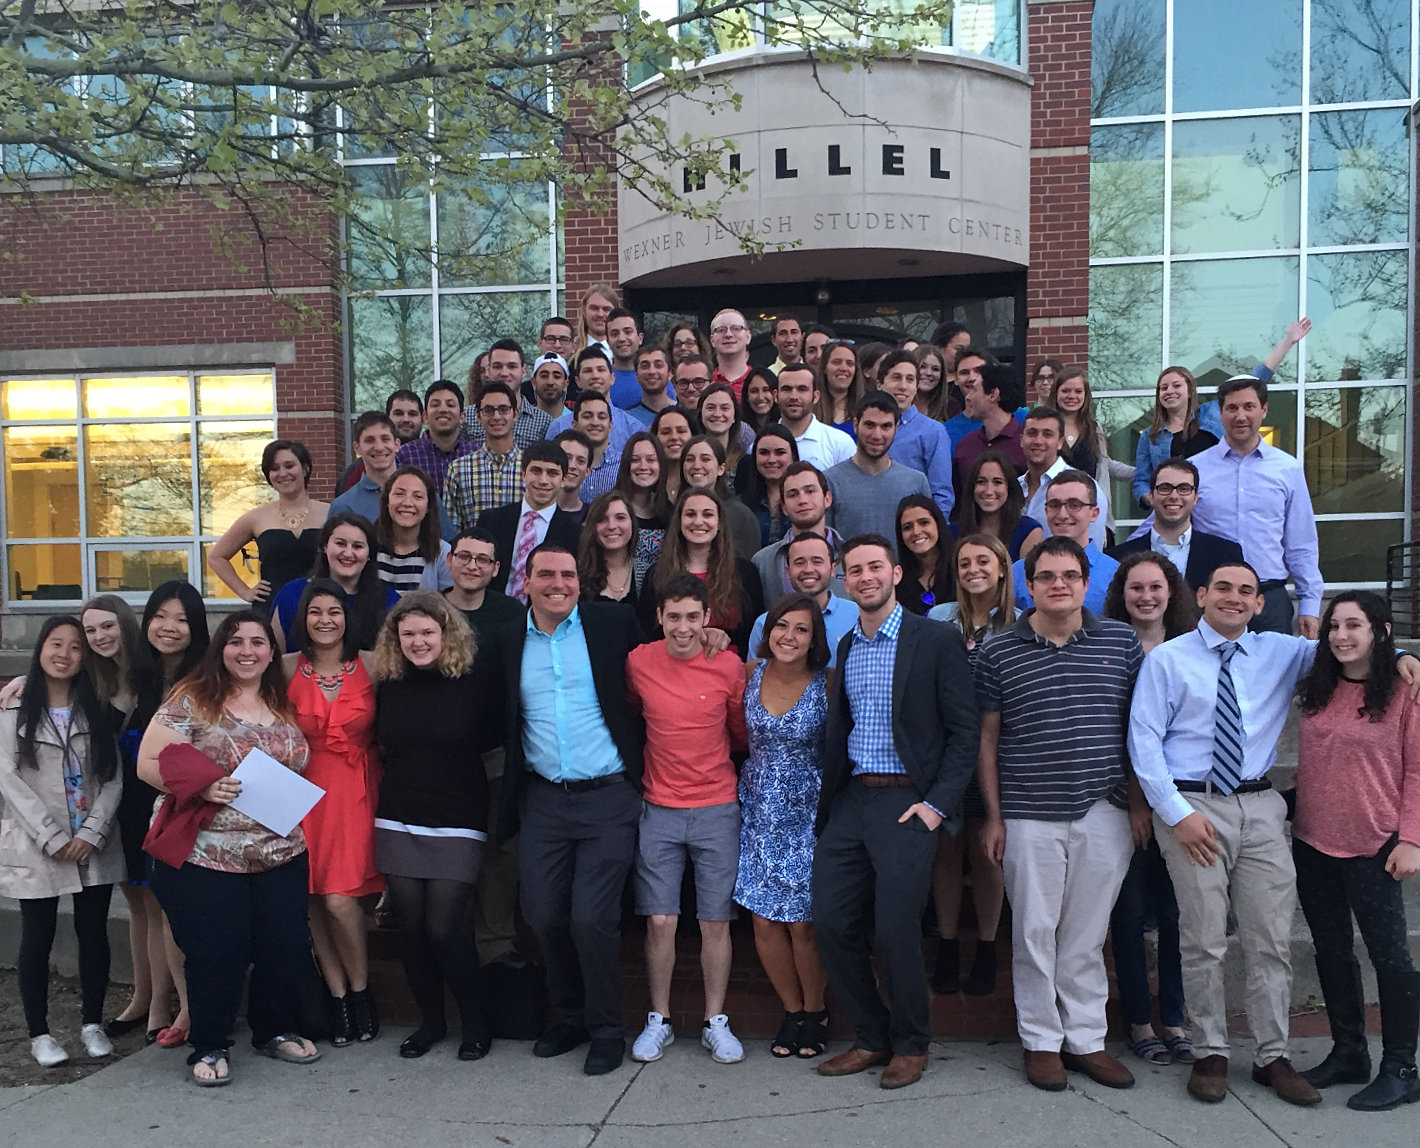 OSU Hillel - Wexner Jewish Student Center   Student Leaders